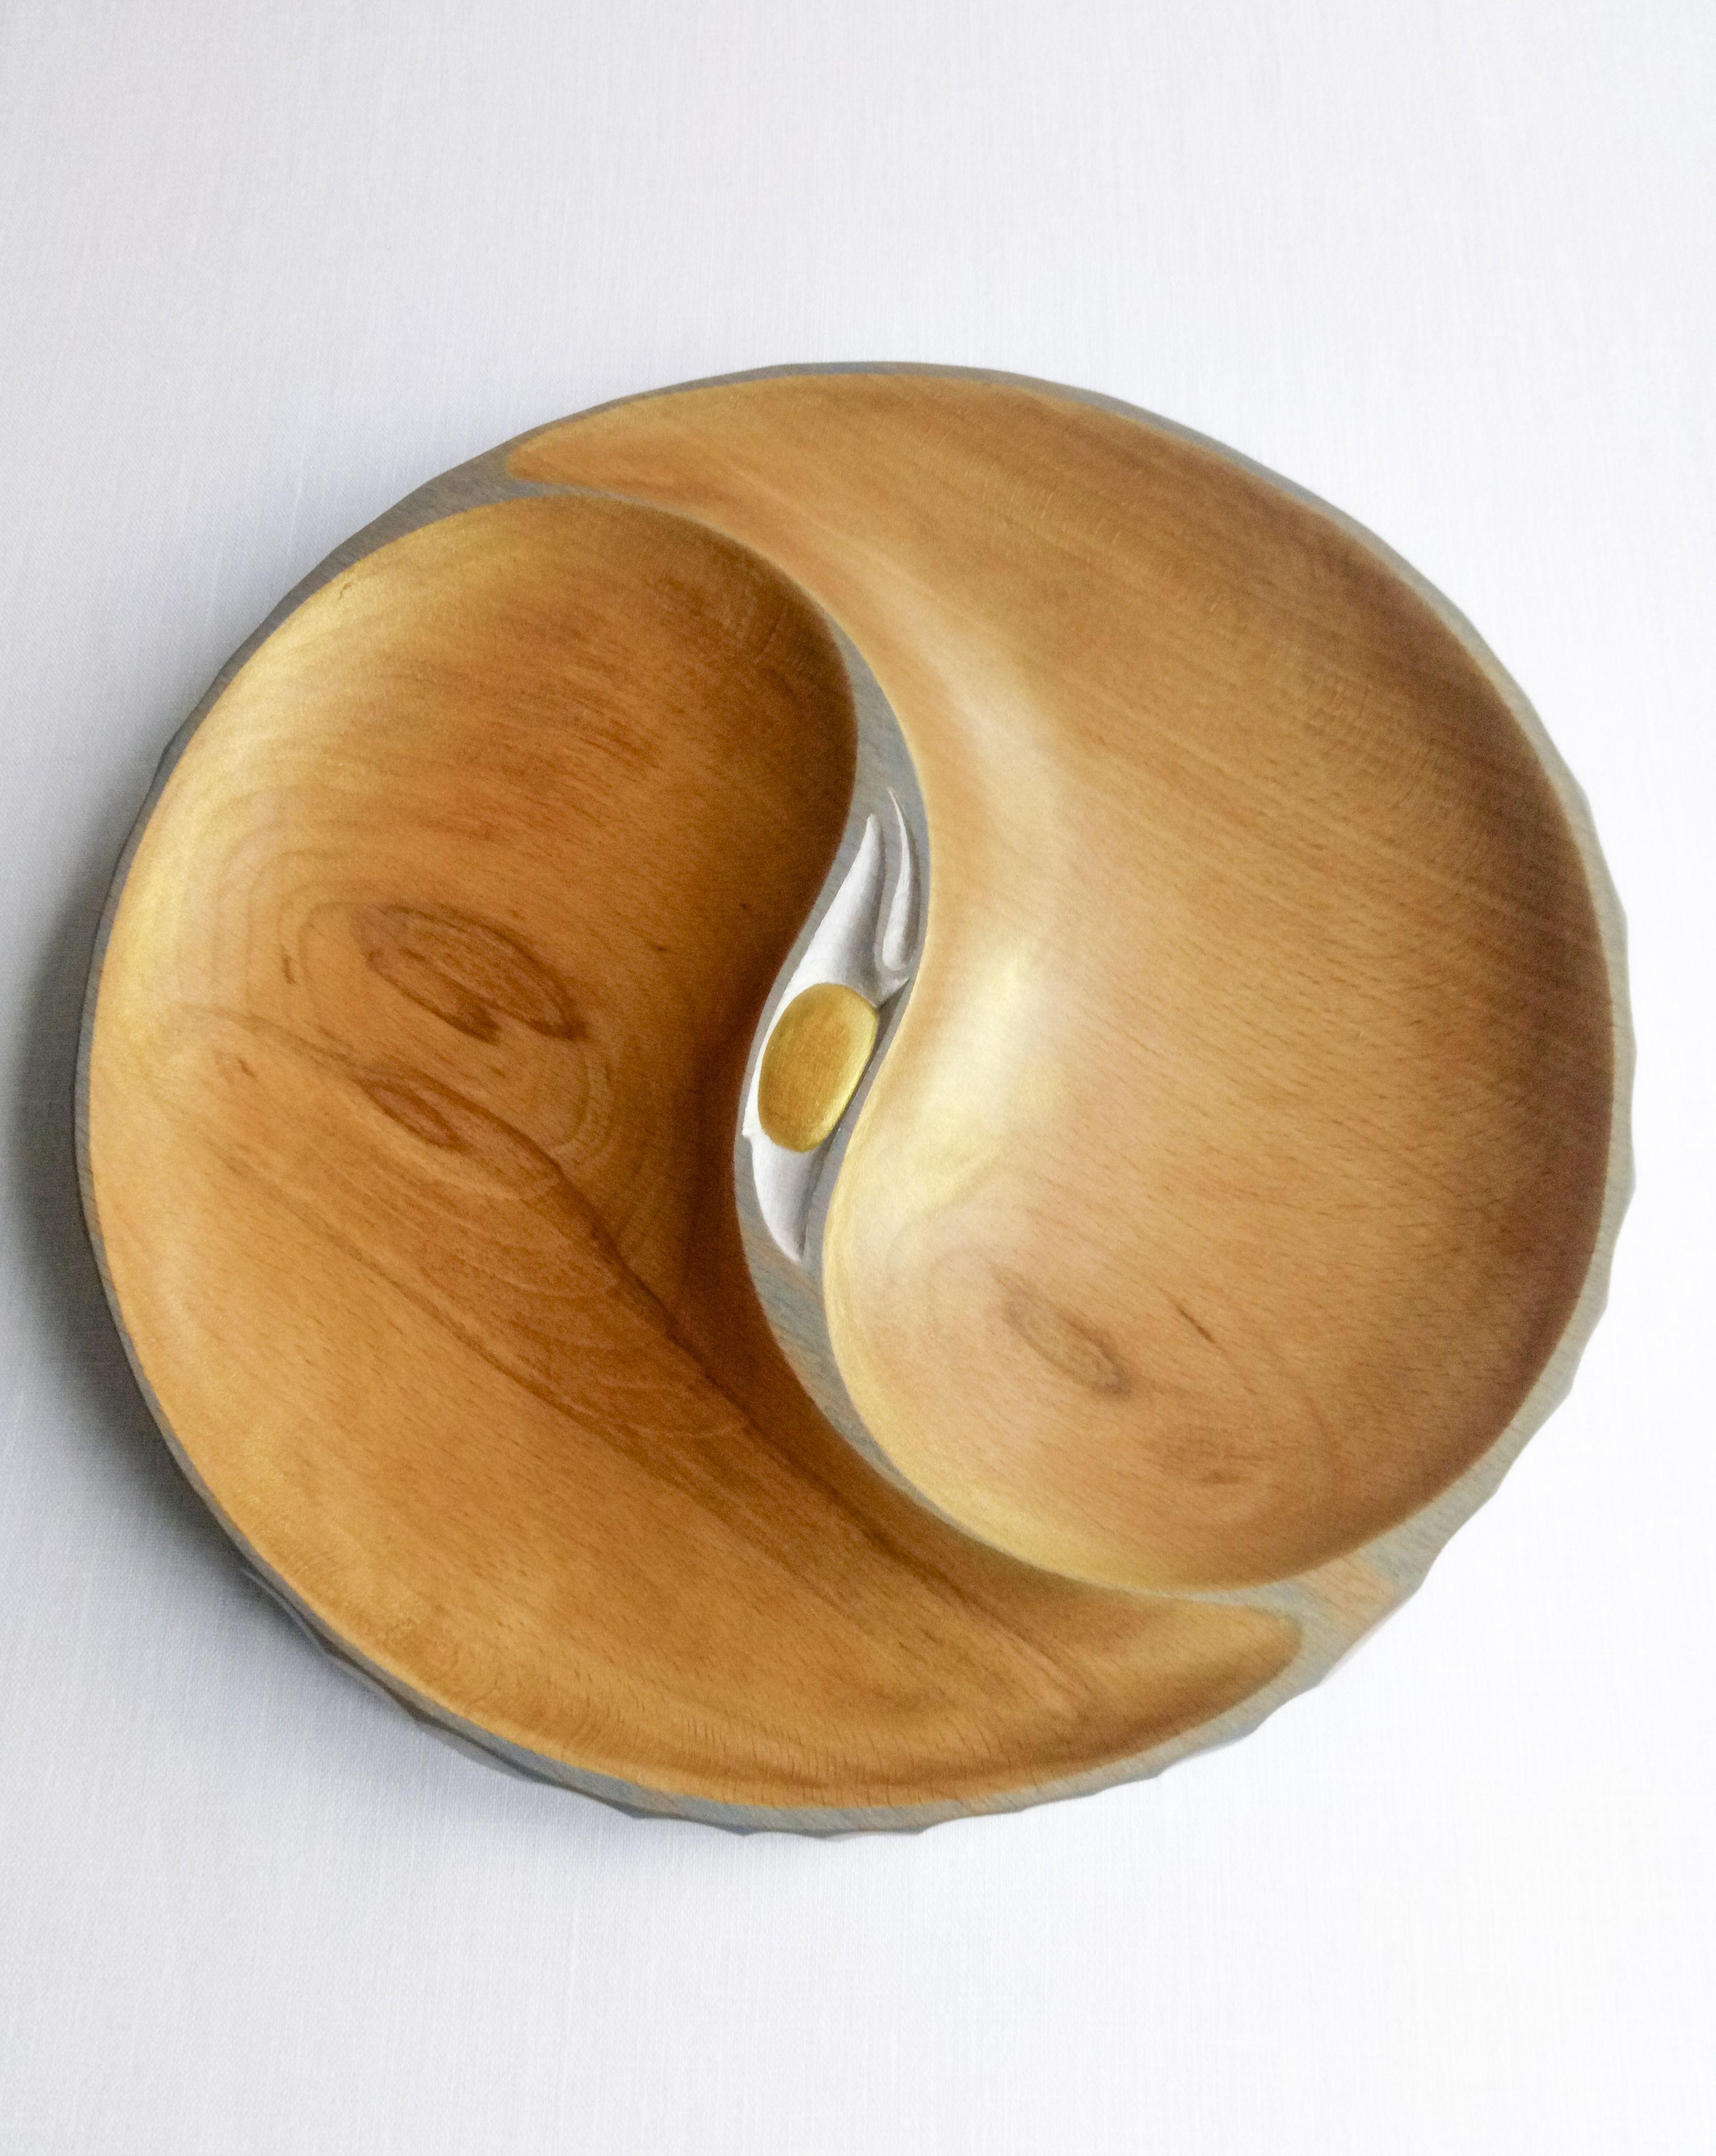 Big dishfrom beech wood yinyang ecofriendly materials hand